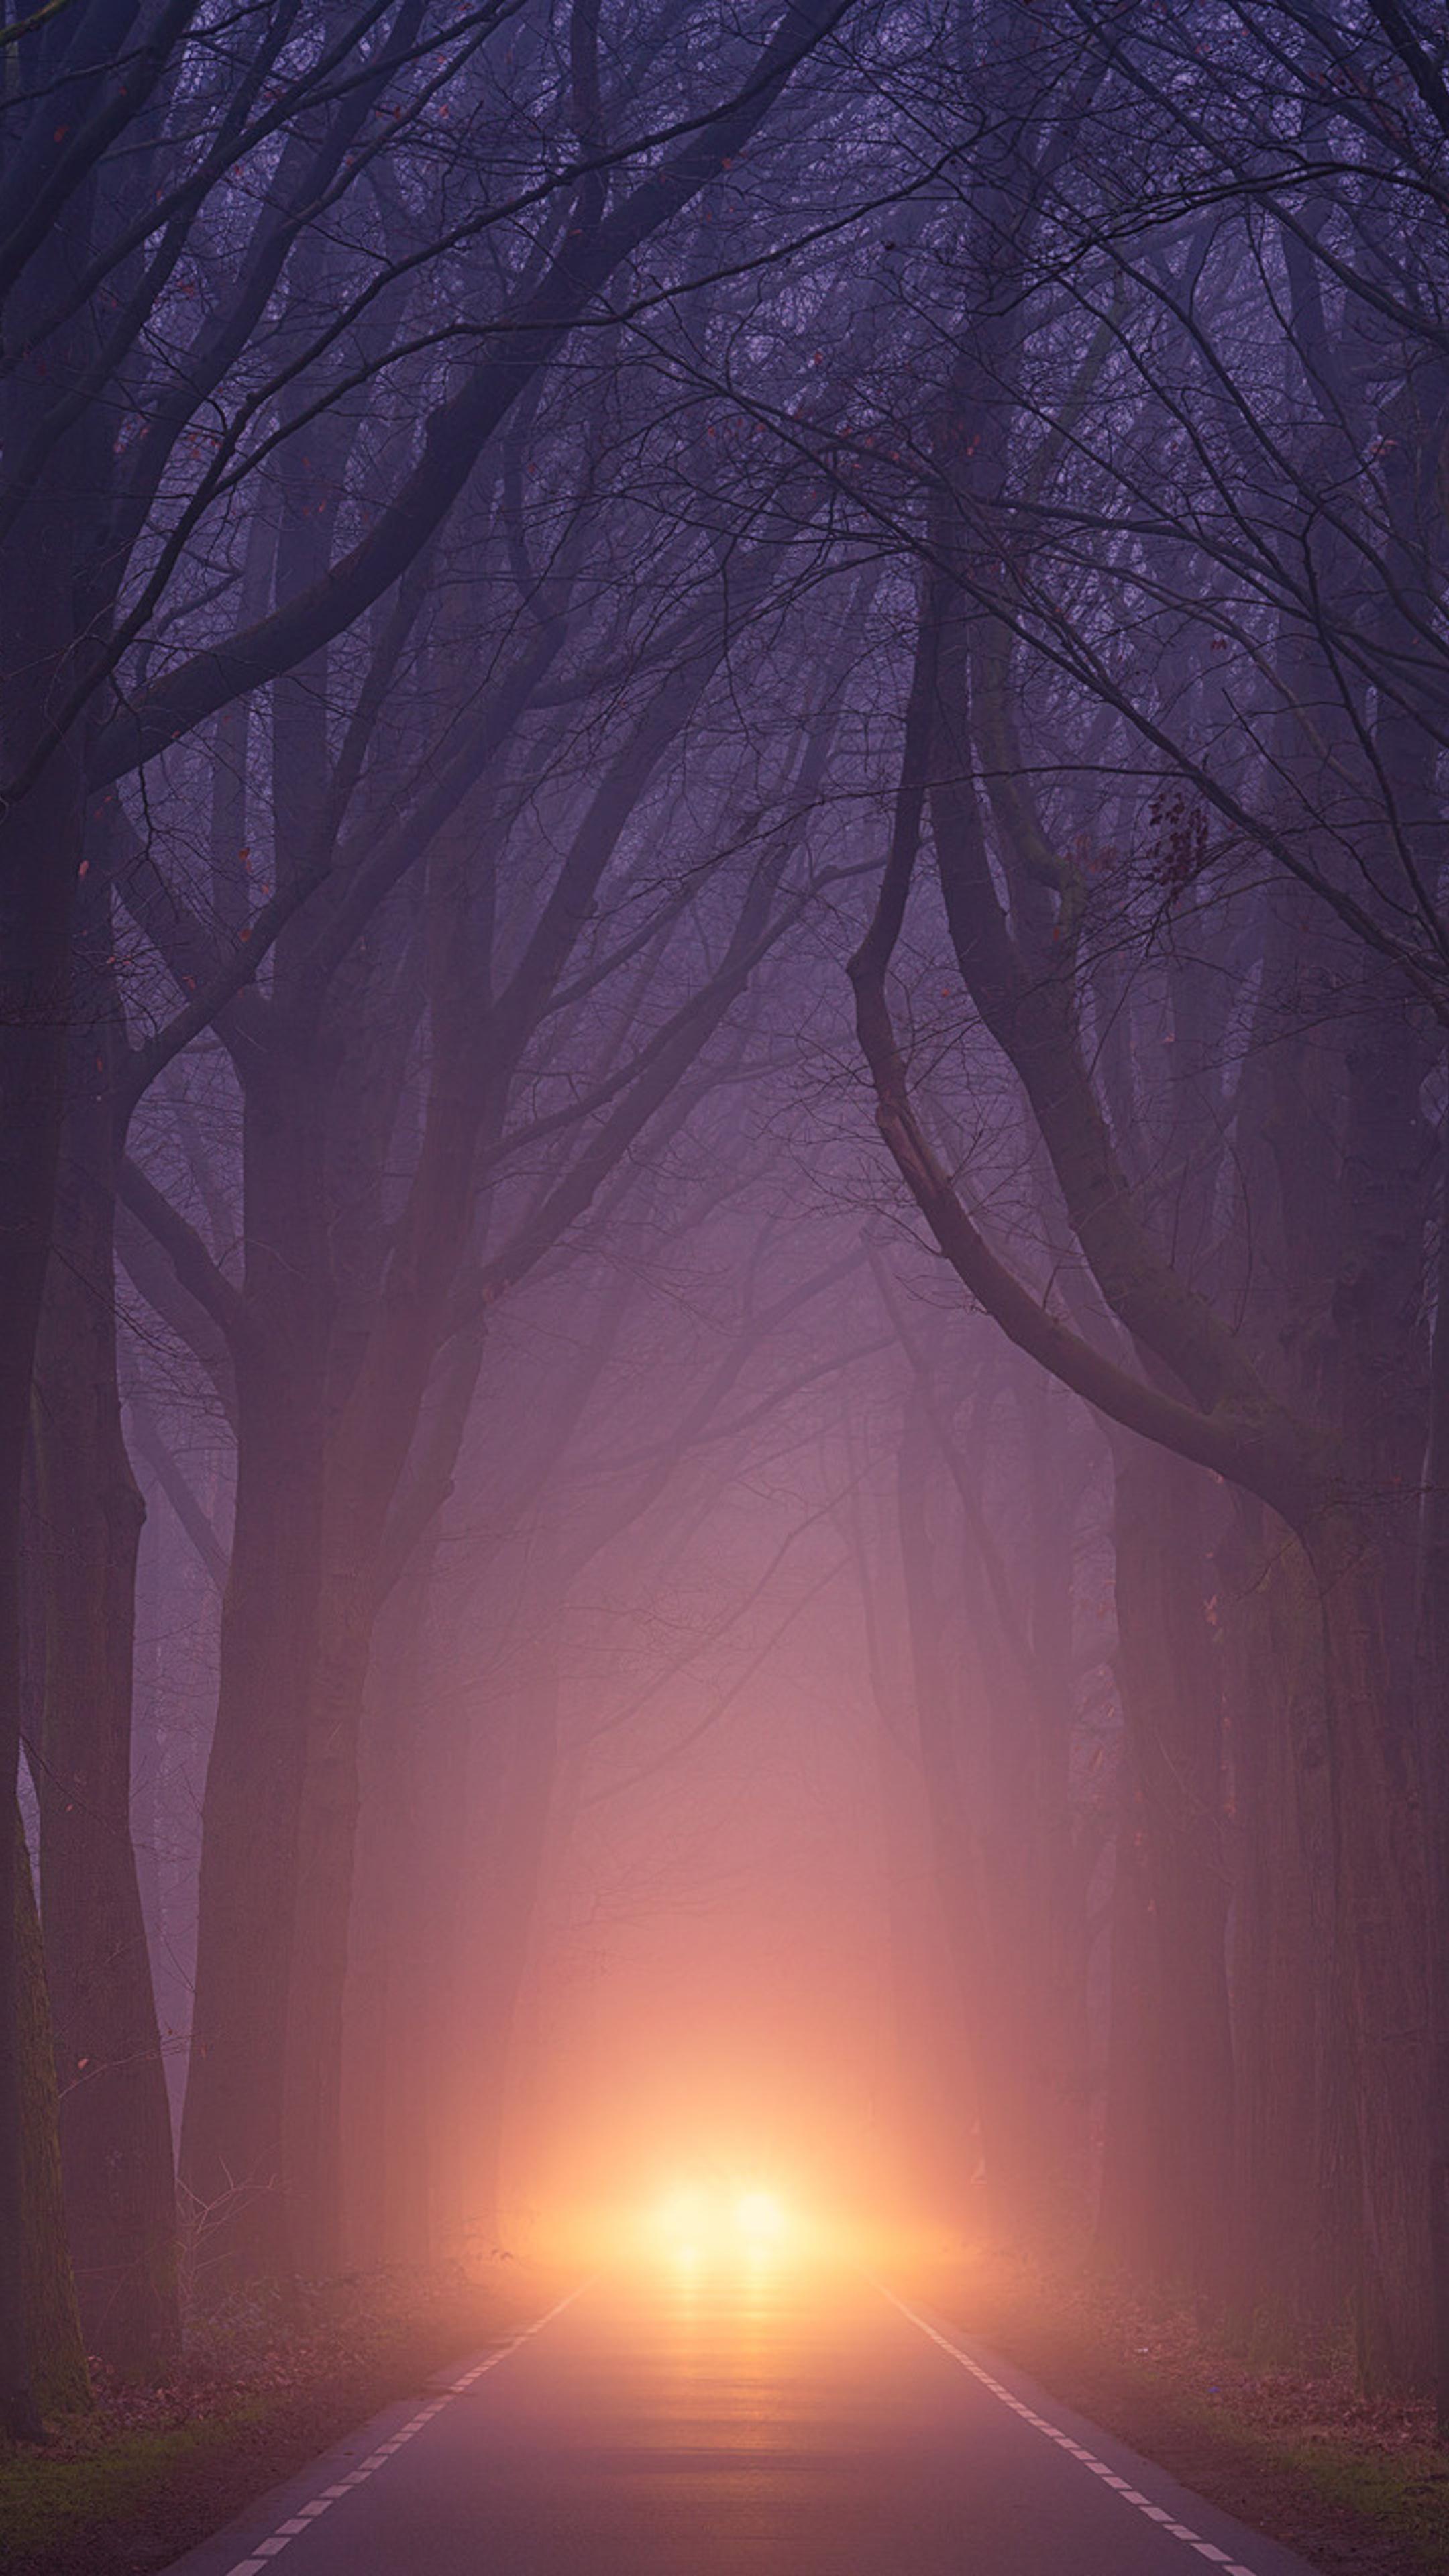 Car Light Road Autumn Trees Foggy Weather Y9